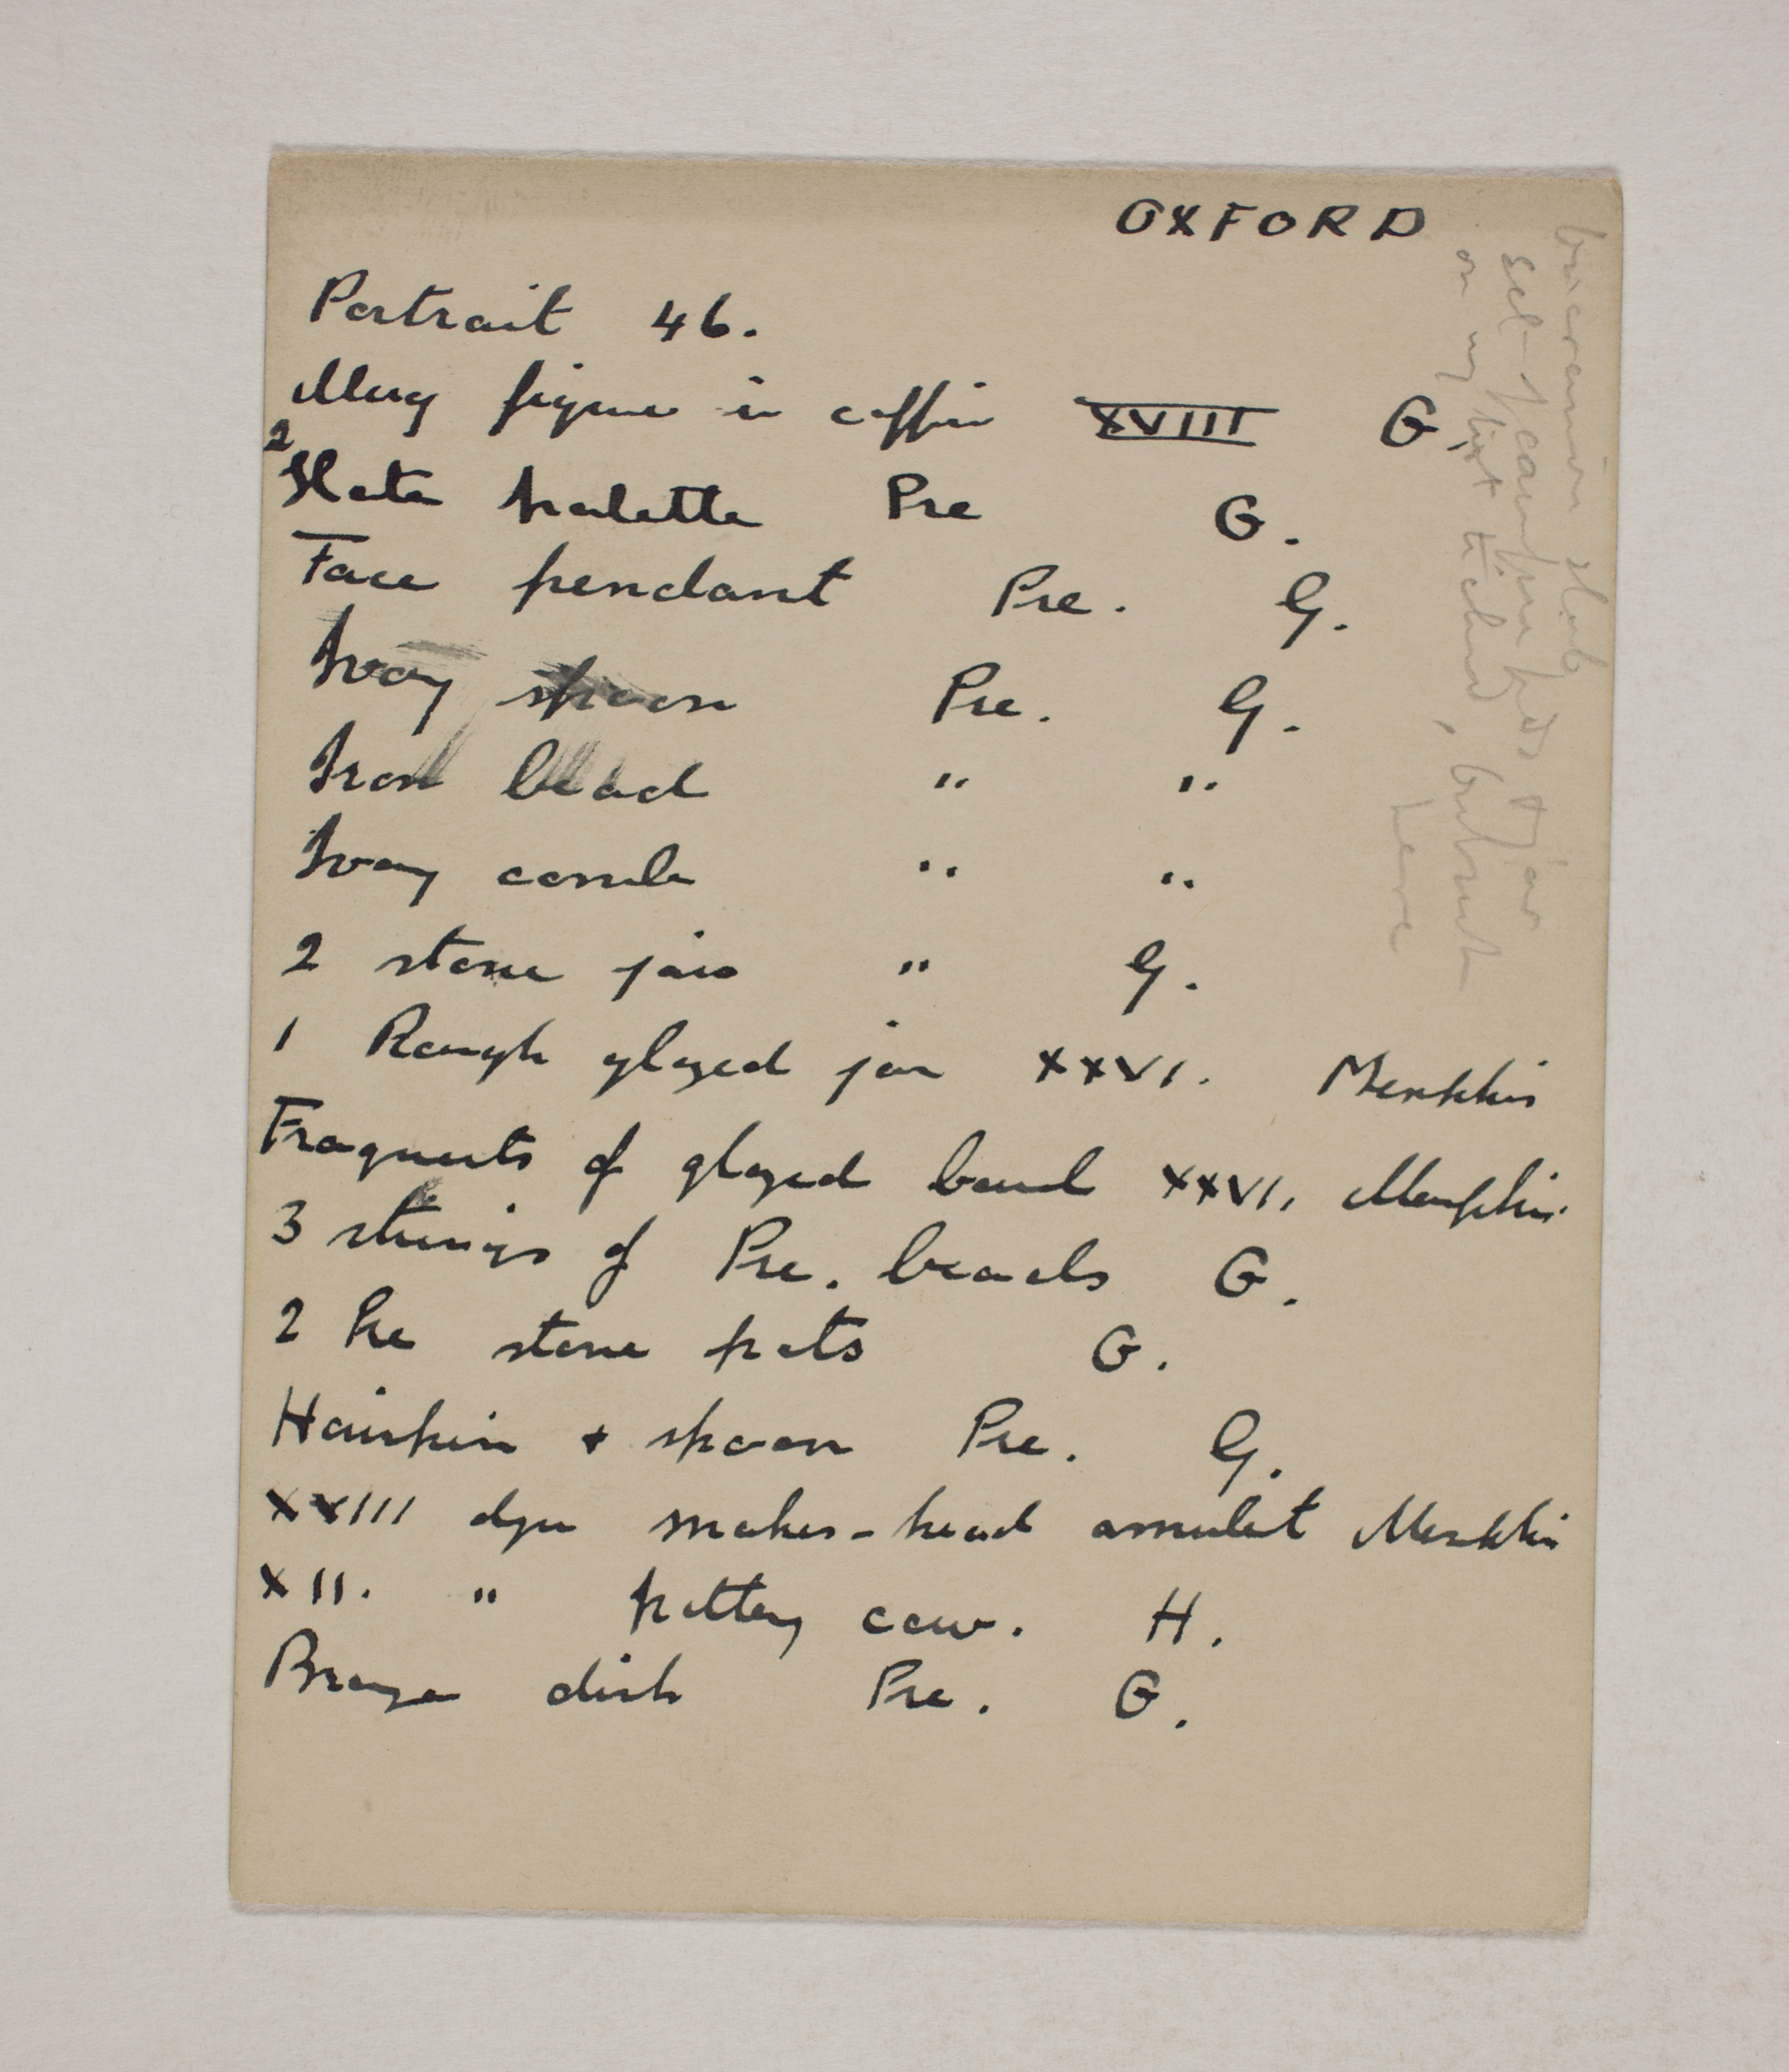 1910-11 Hawara, Gerzeh, Memphis, Mazghuneh Individual institution list  PMA/WFP1/D/19/22.1